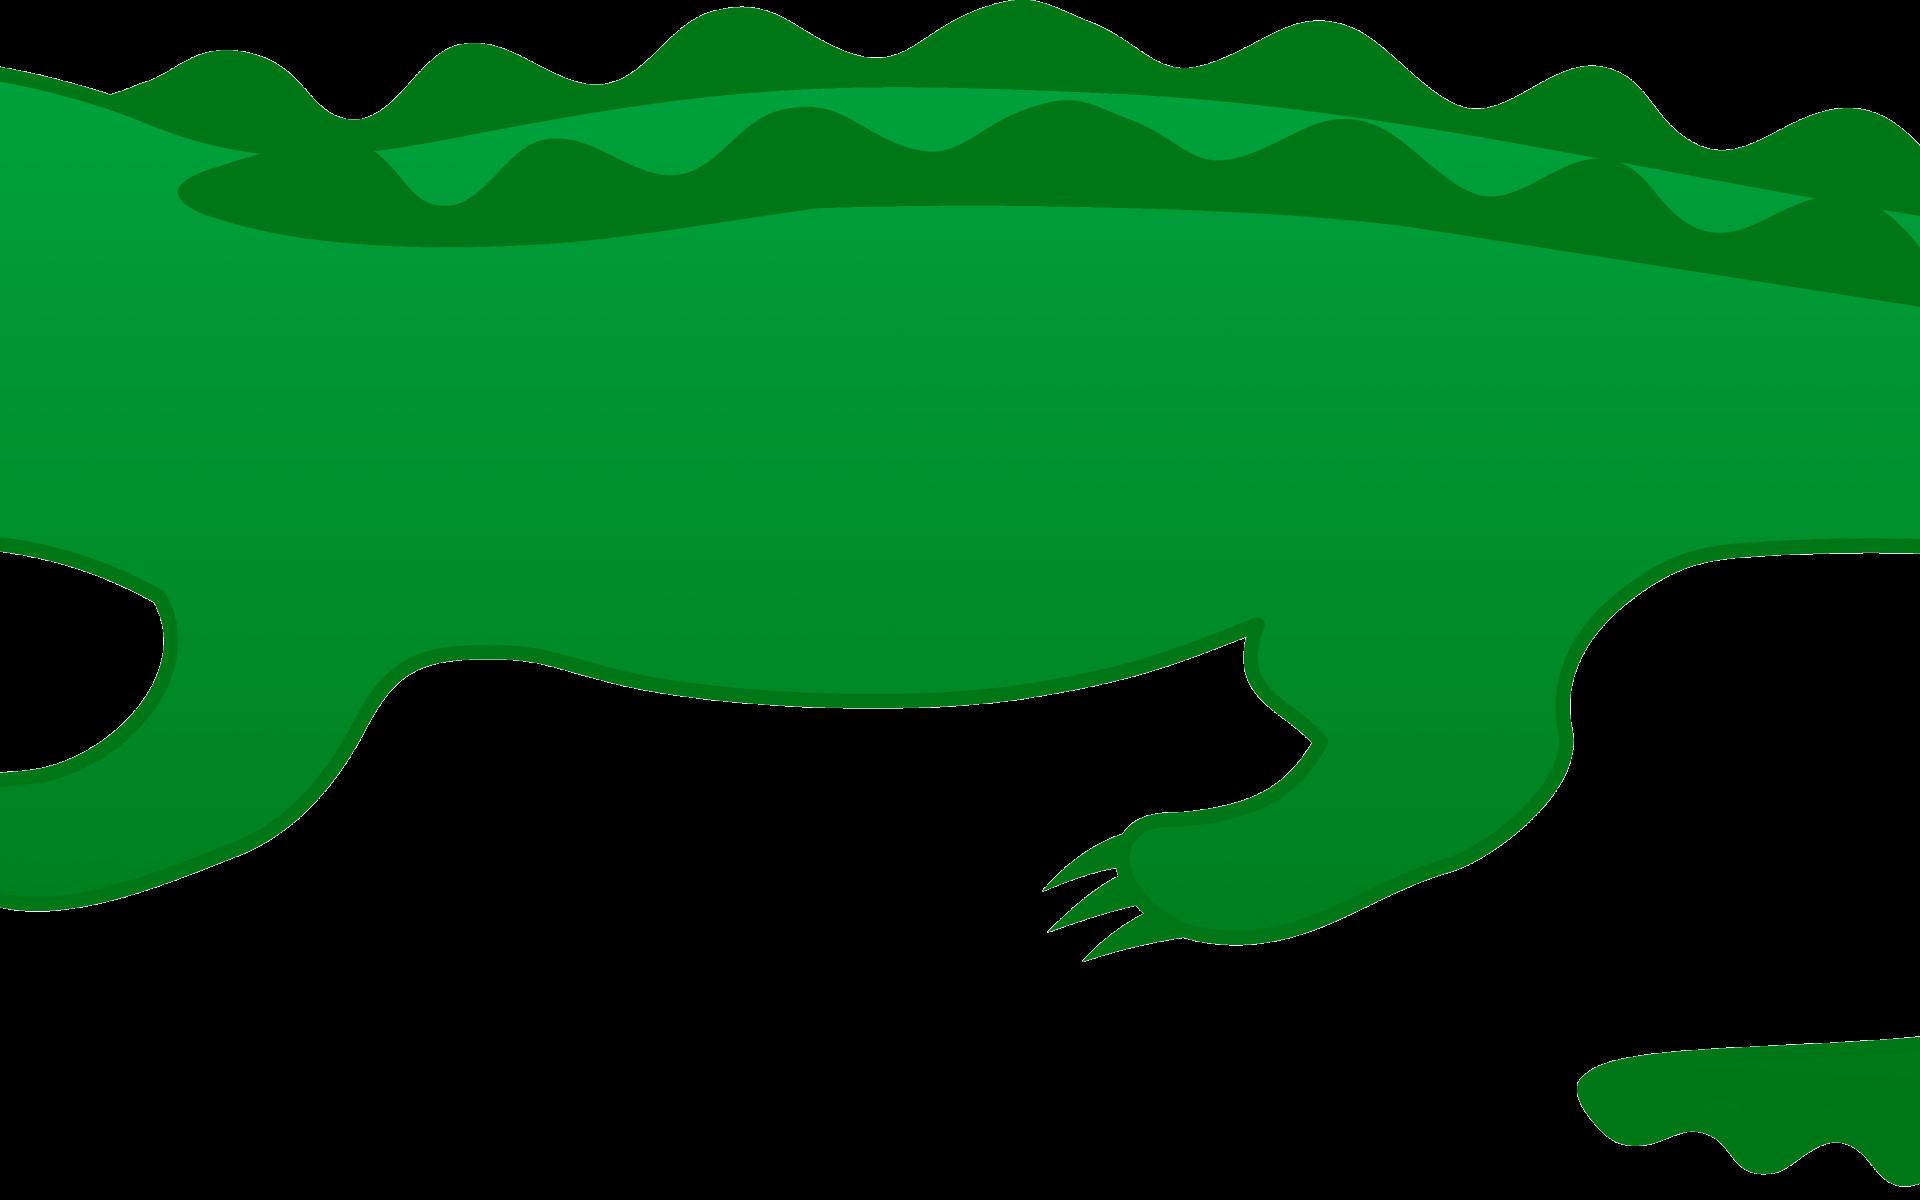 png transparent stock Alligator clipart cool cartoon. X carwad net.